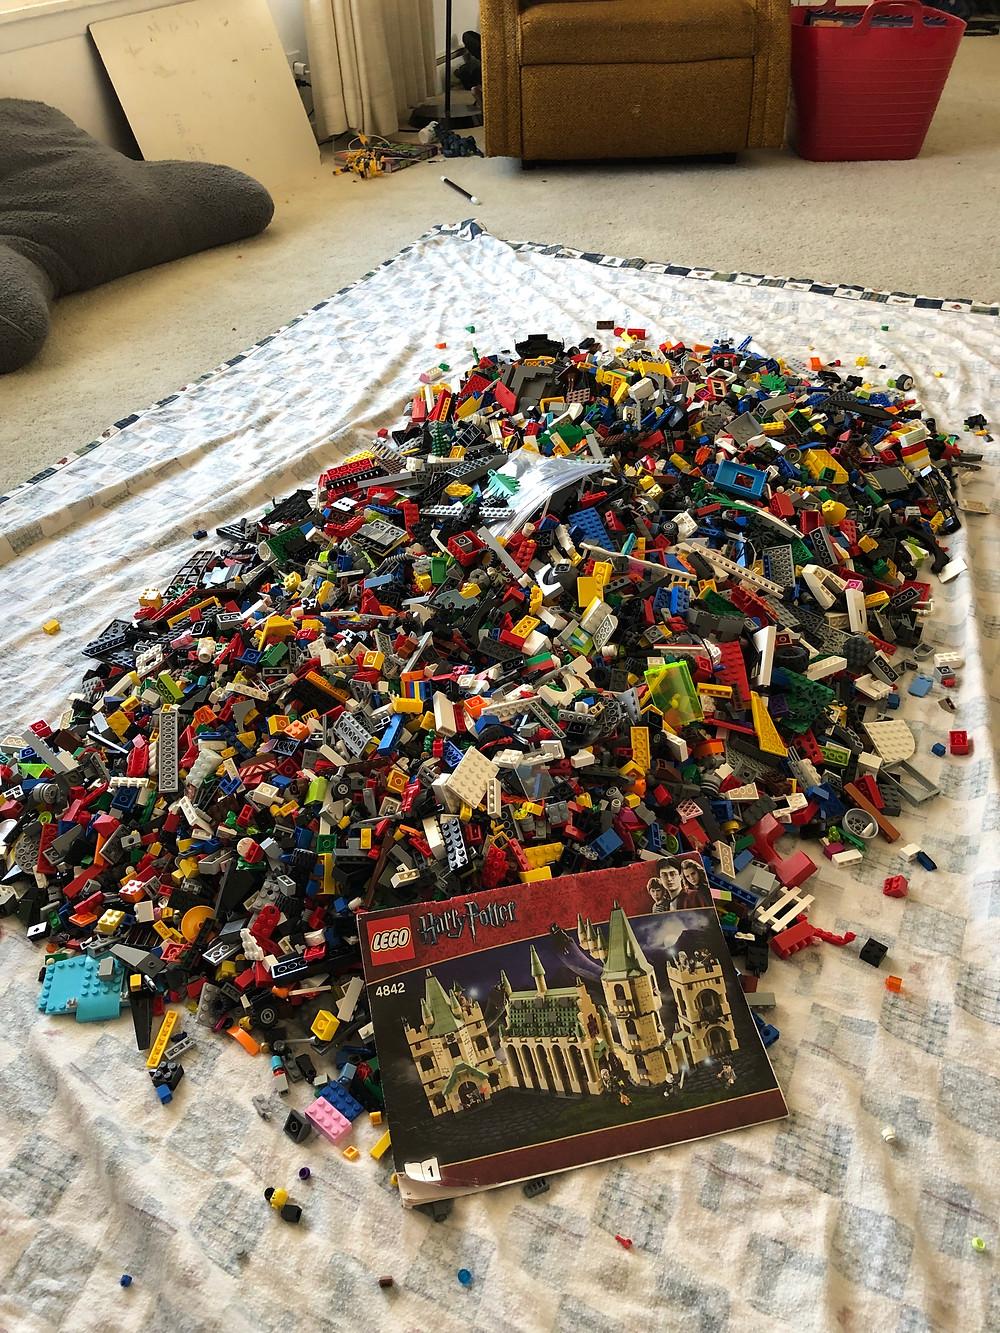 Big pile of LEGO